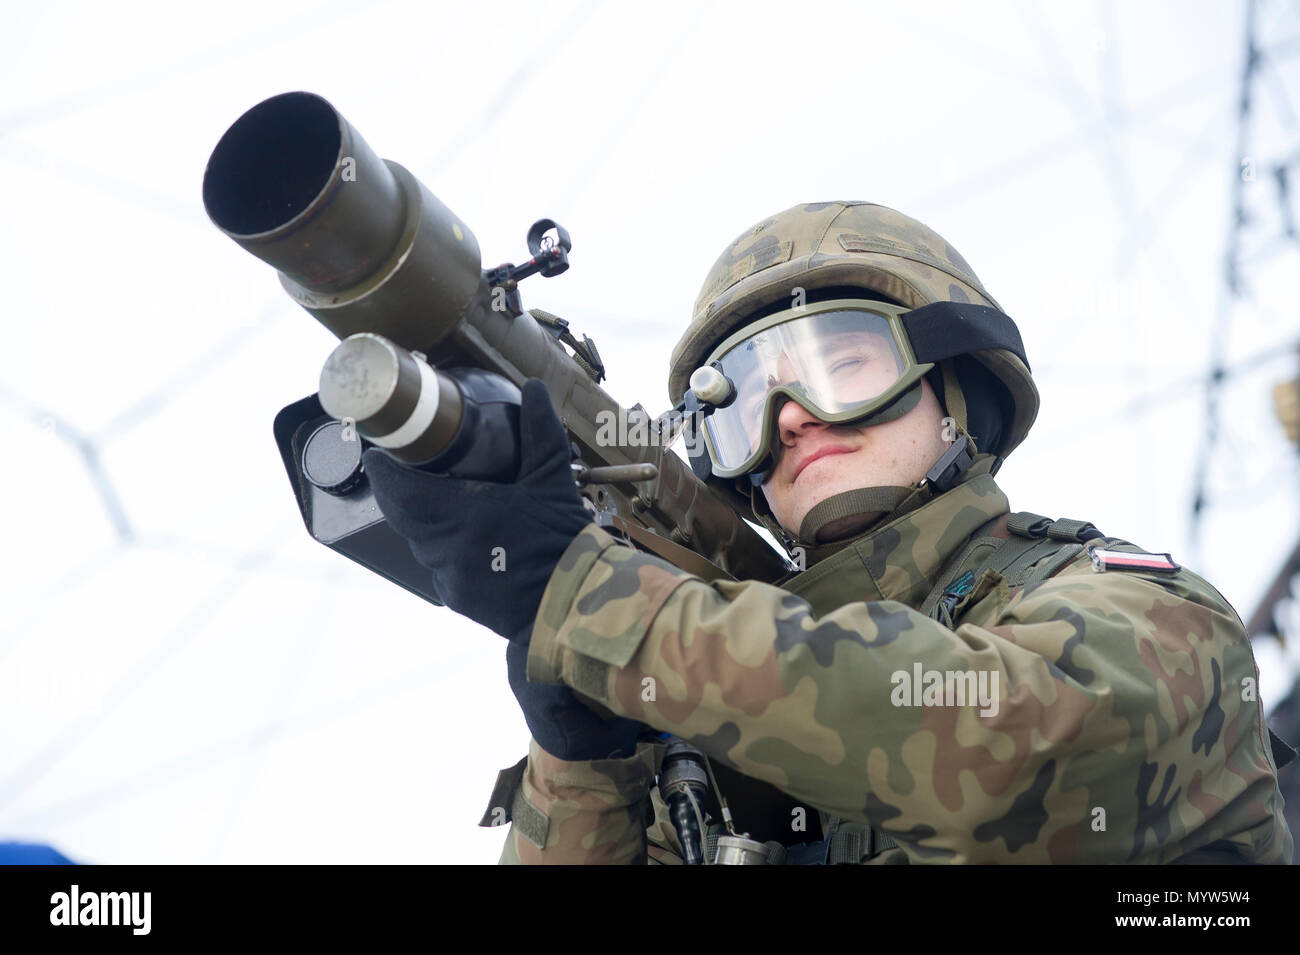 Air Defense Missile System Stock Photos & Air Defense